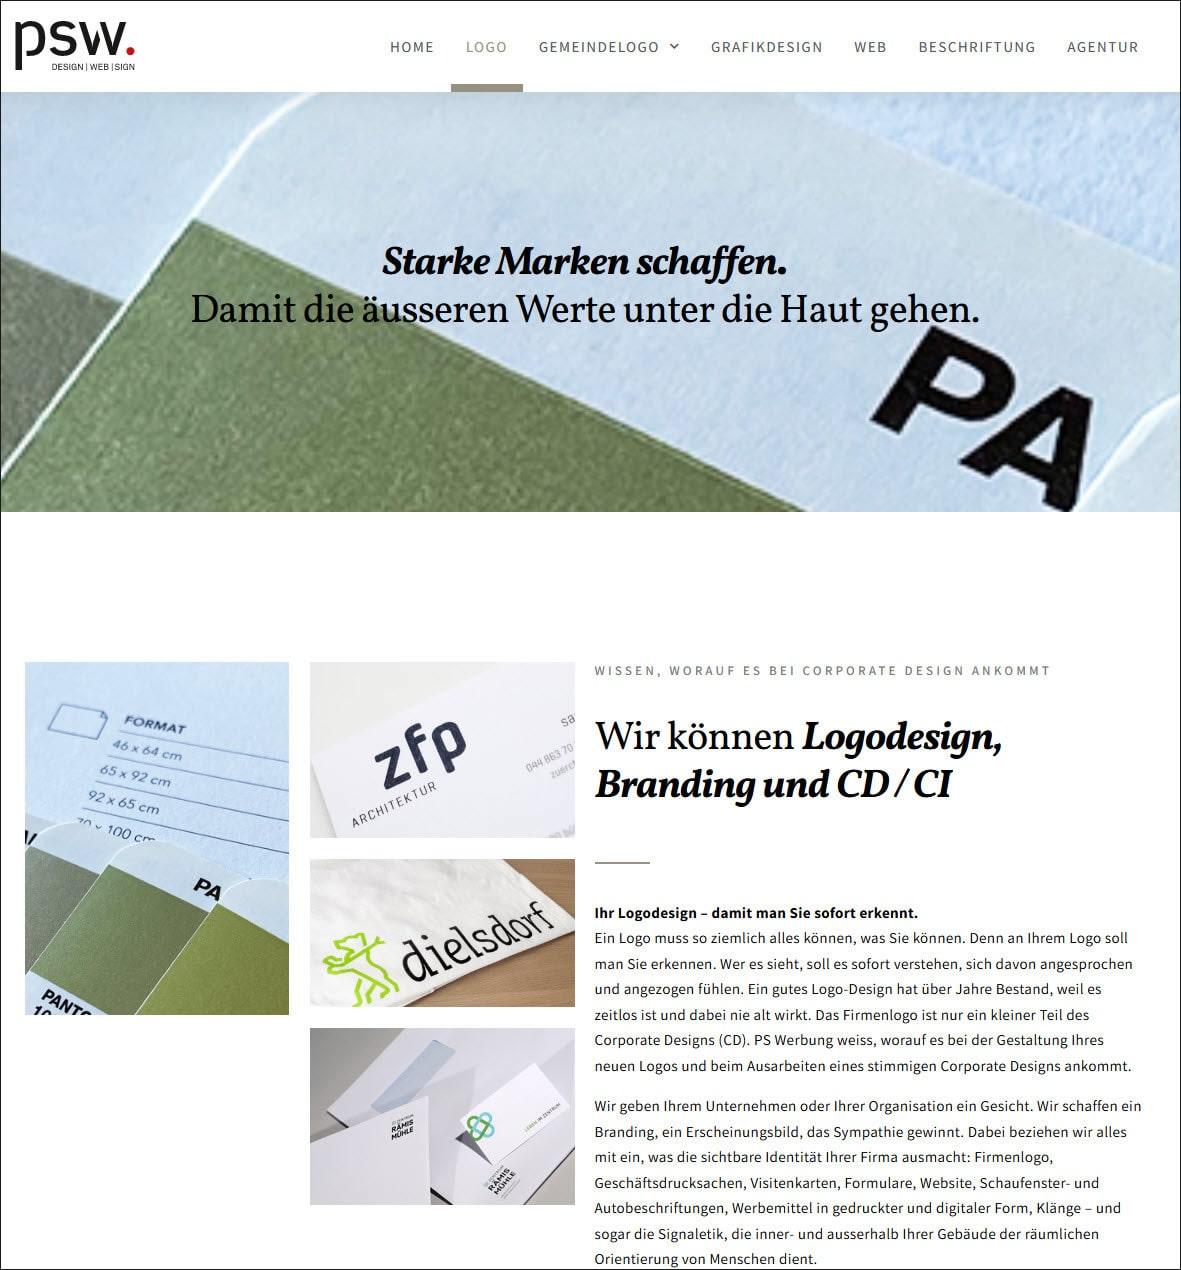 Logodesign Agentur - PS Werbung